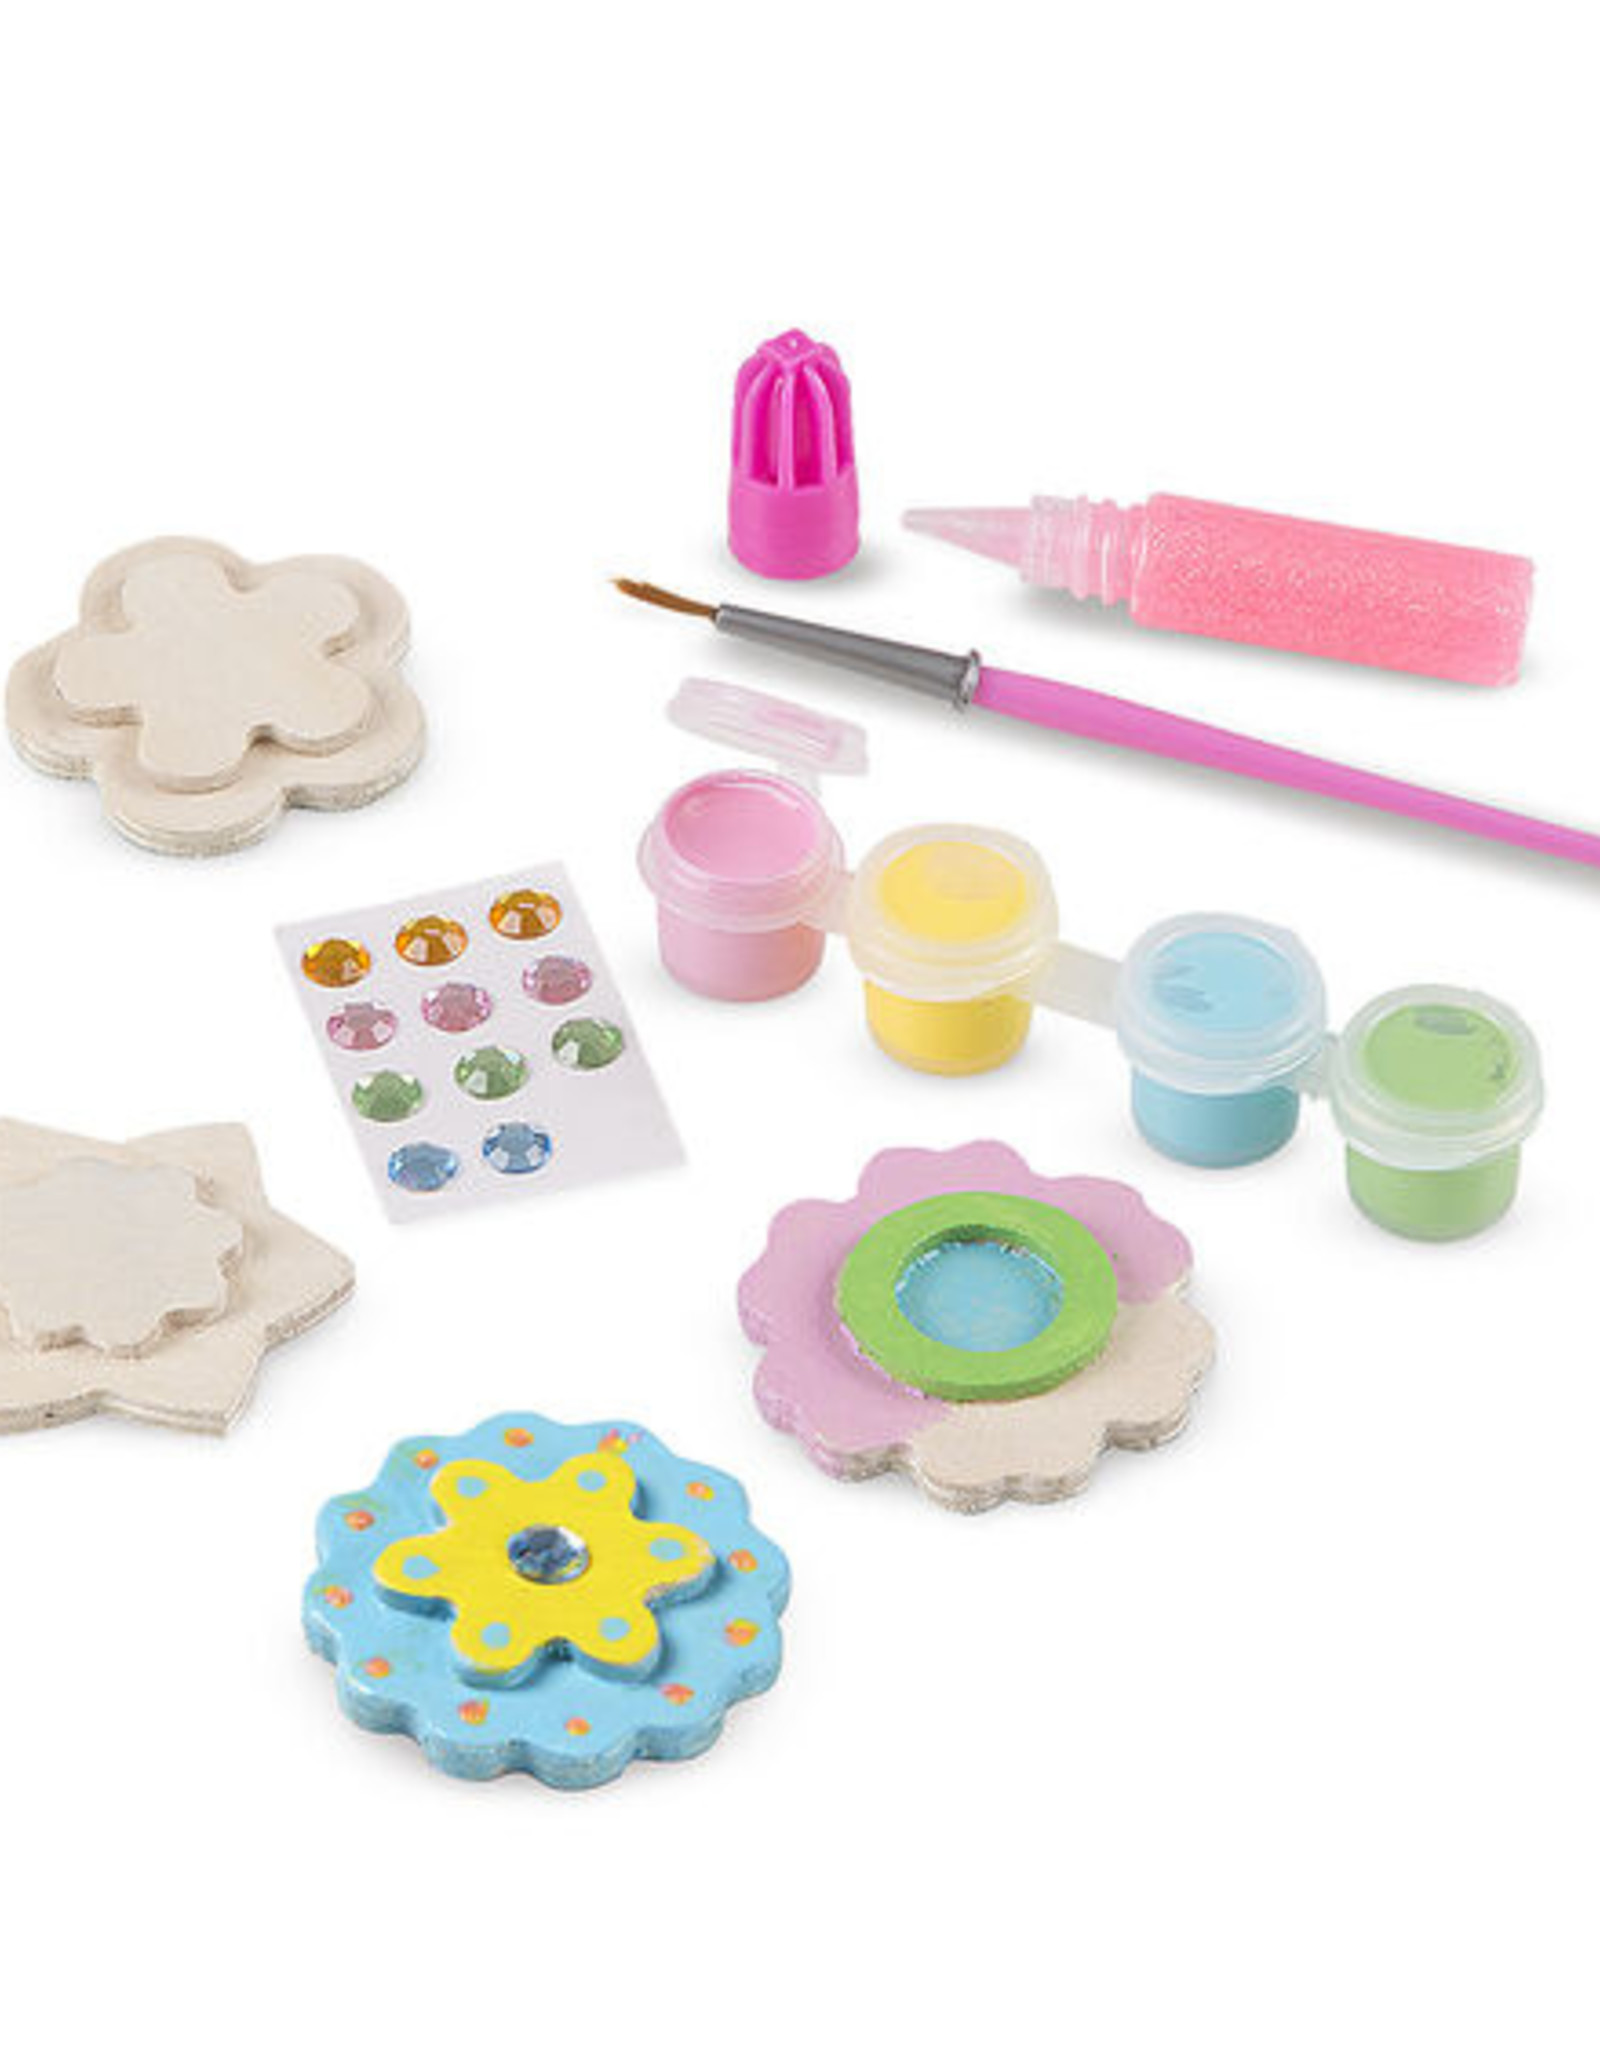 Melissa & Doug MD Paint Kit Flower Magnets